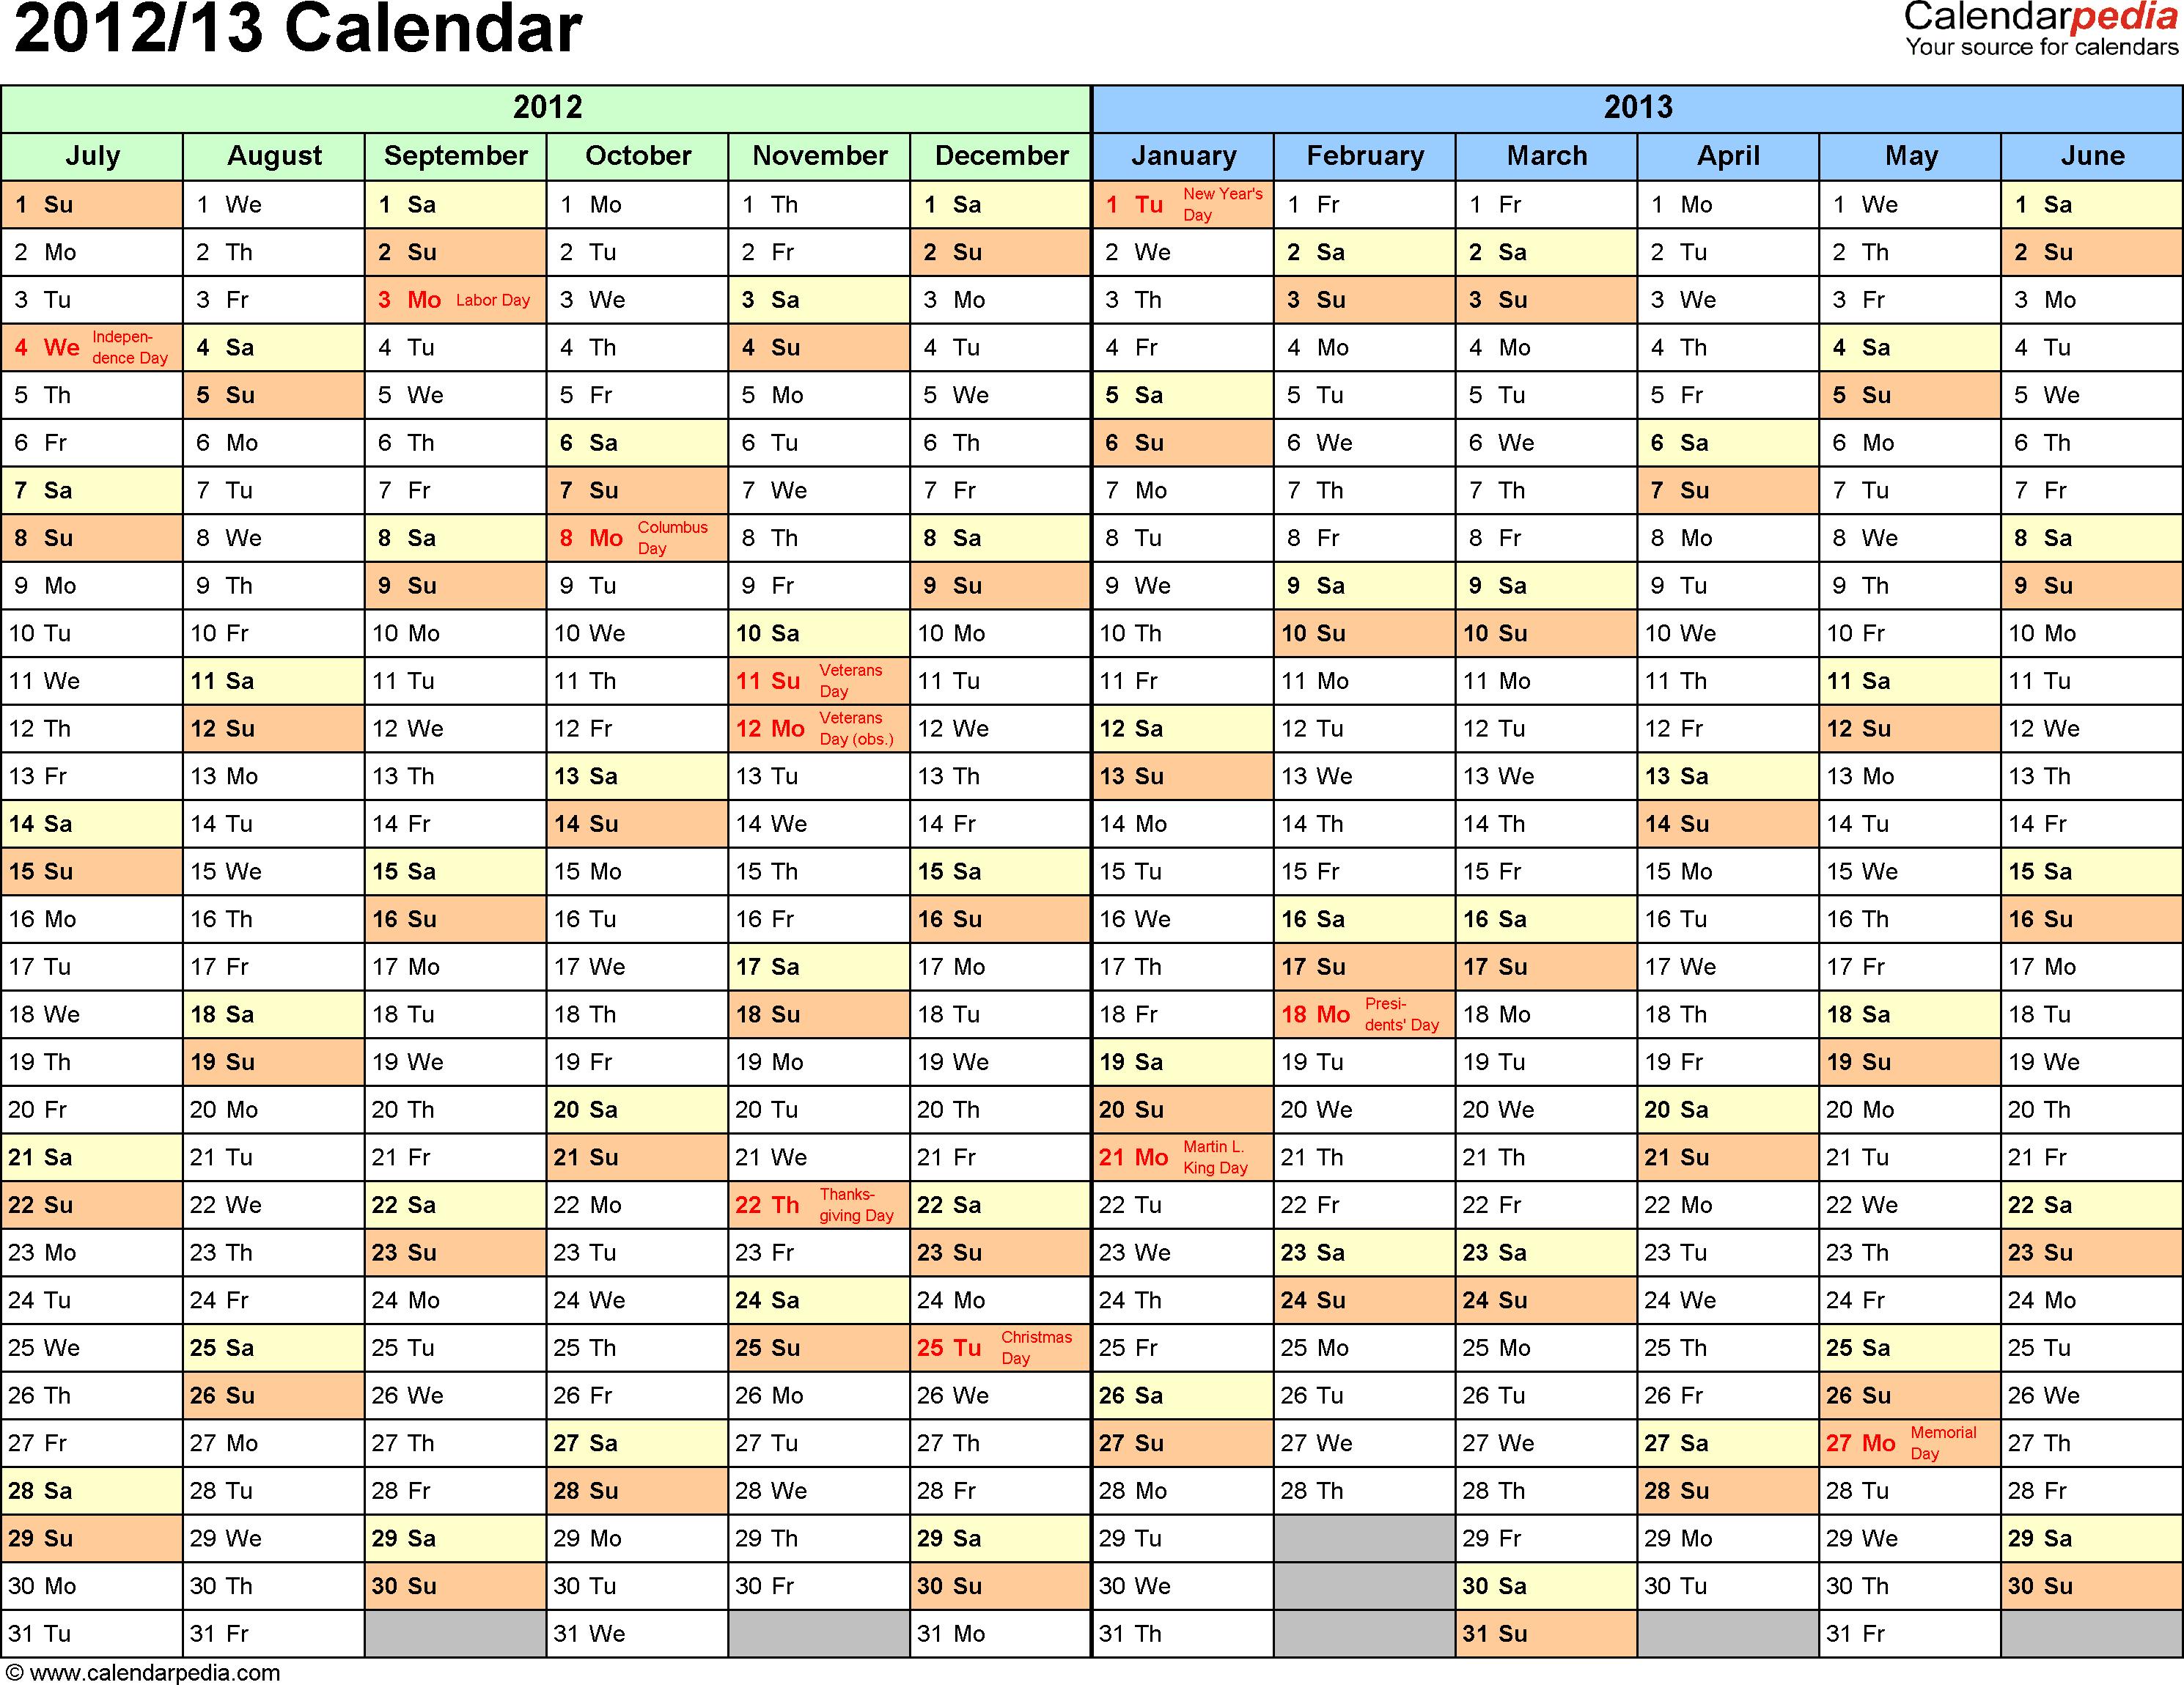 Half Year Calendar Printable : Calendar free printable two year word calendars